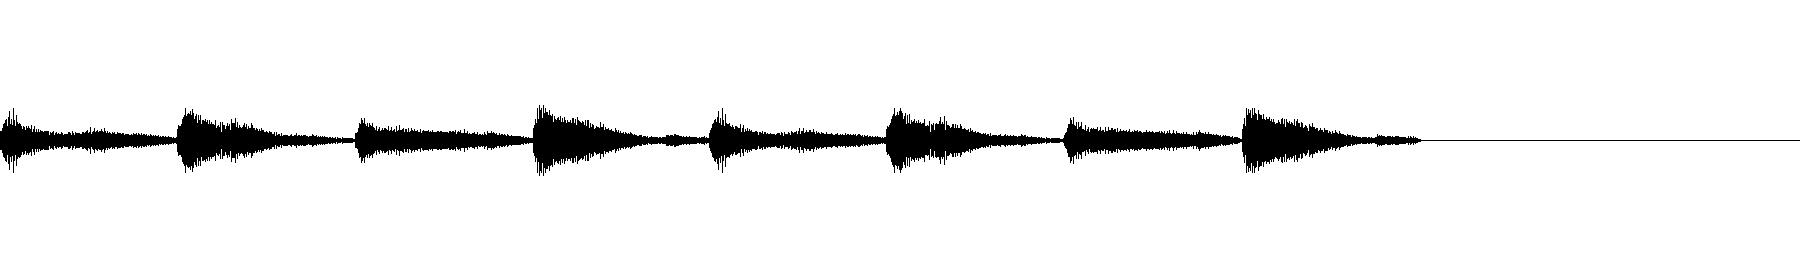 melody 2 80 bpm